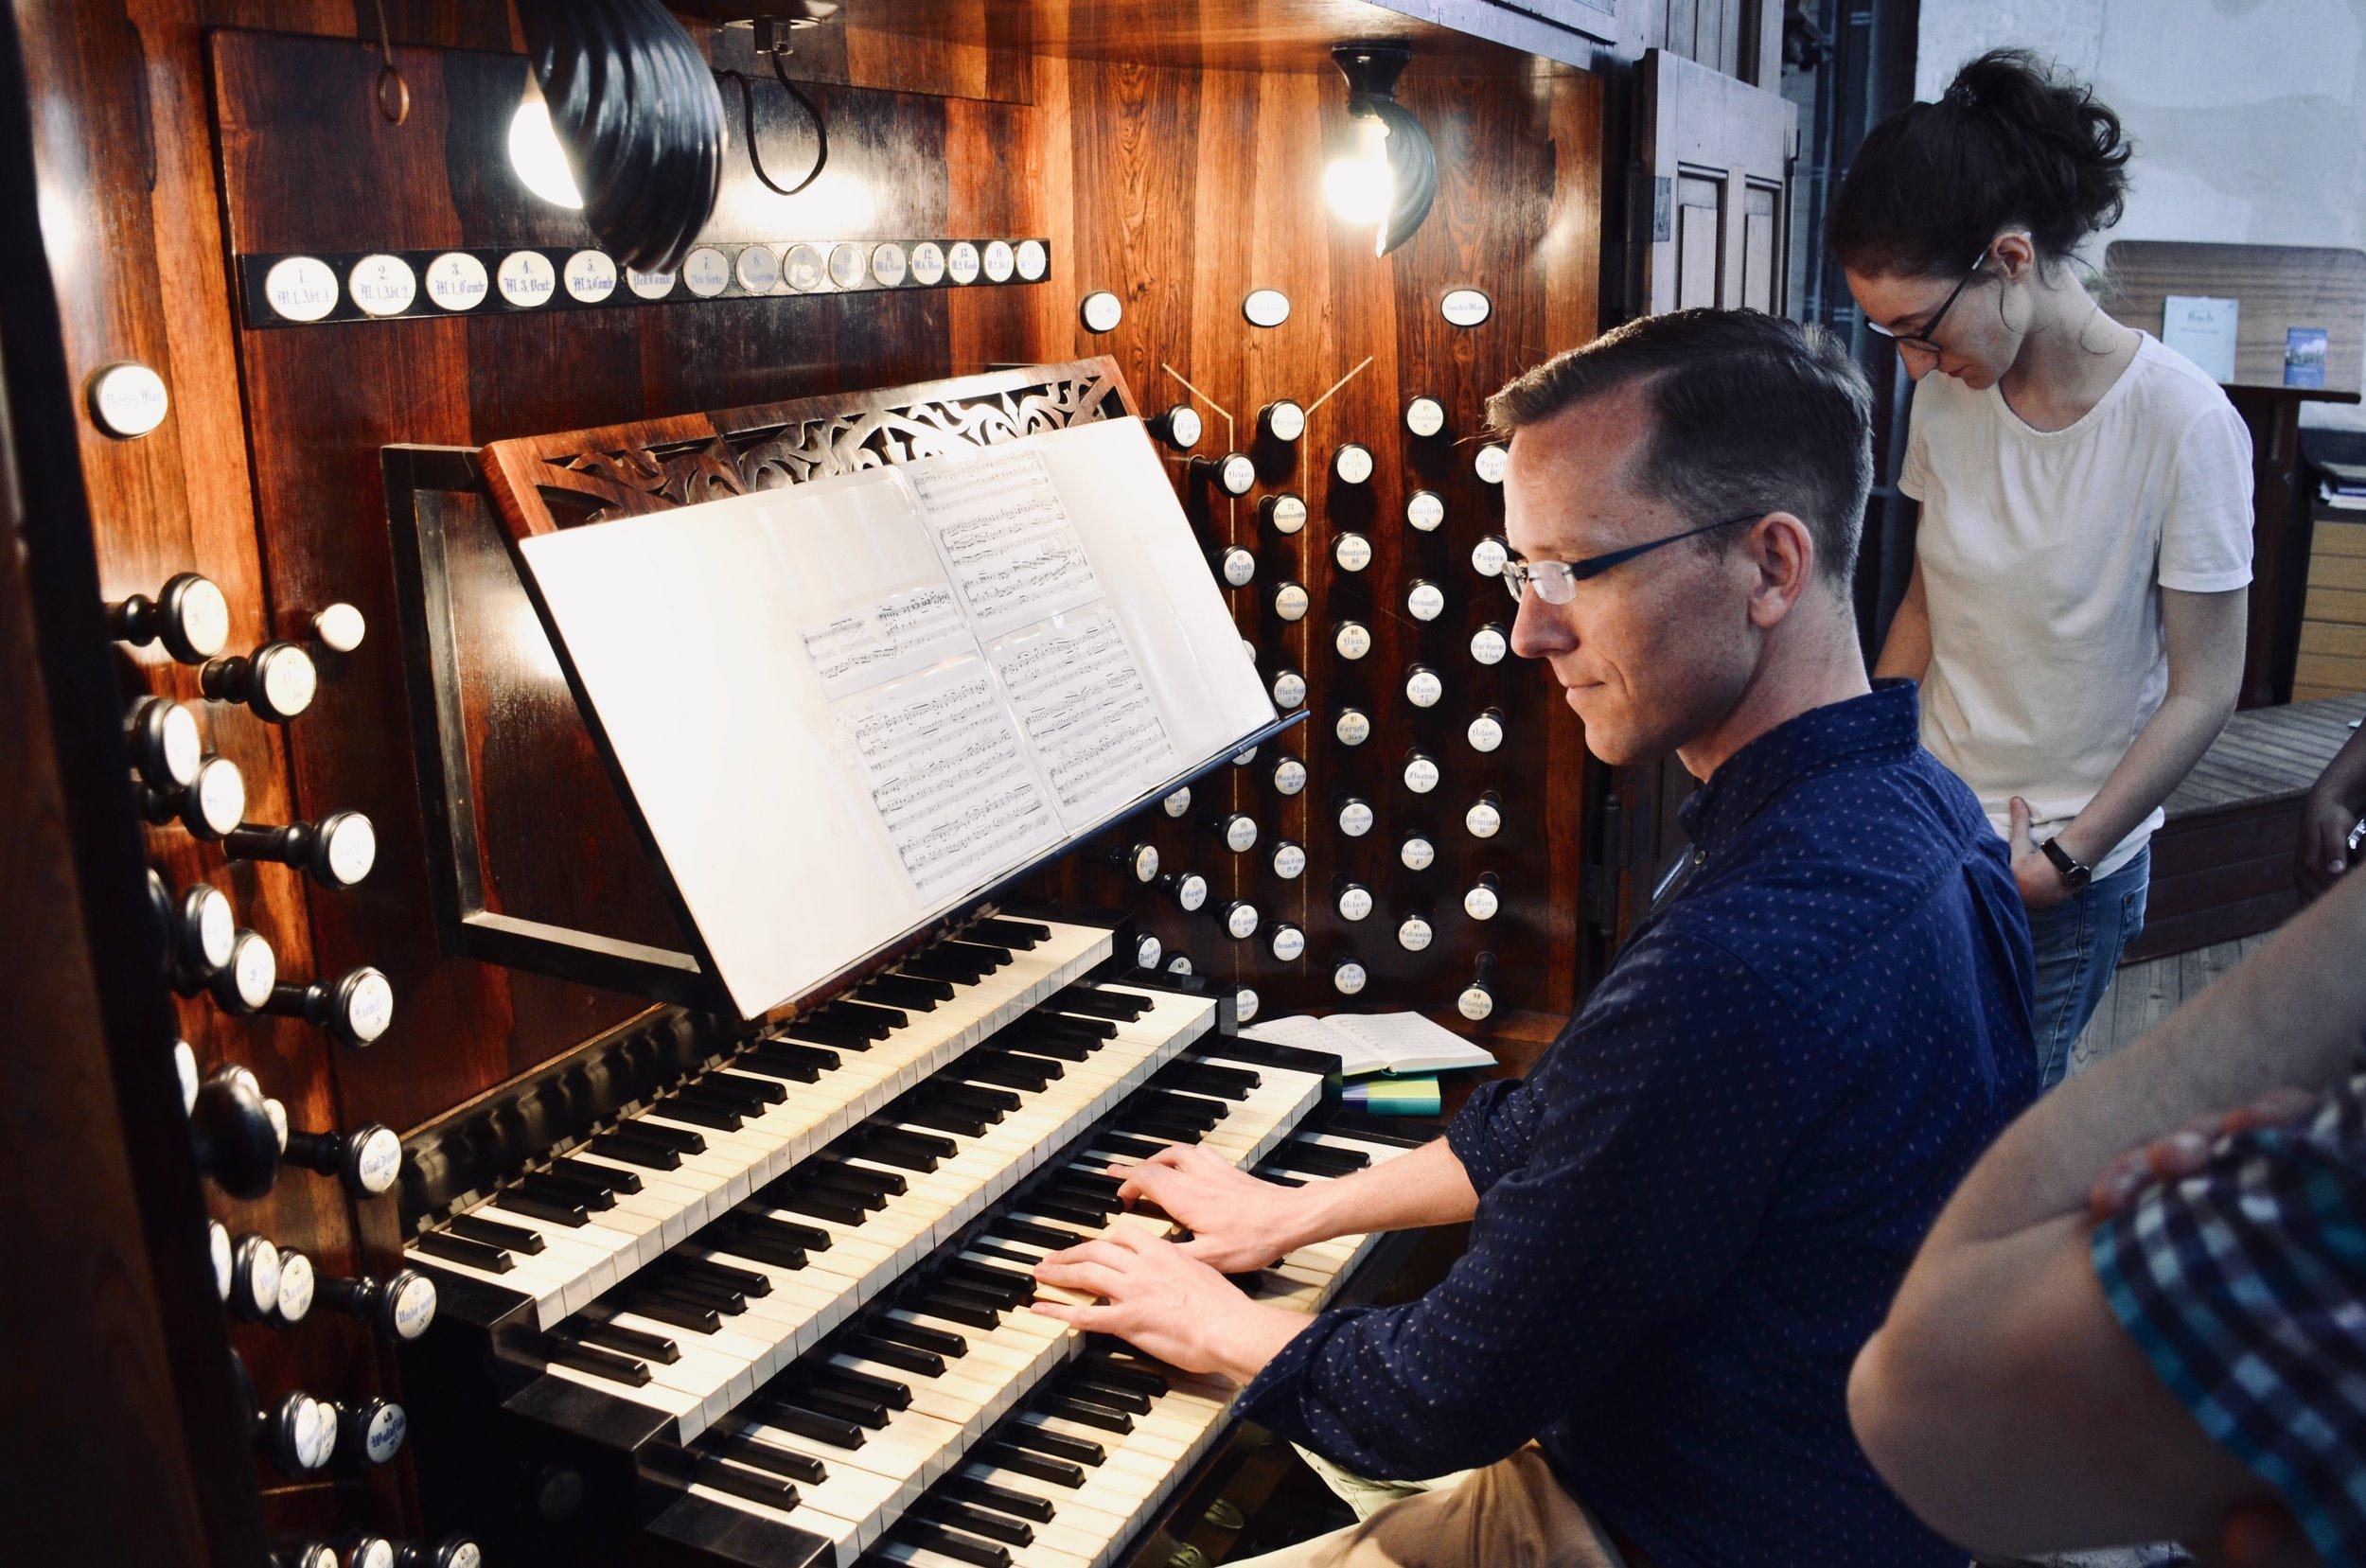 Christian Lane plays 1871 Ladegast organ, Schwerin Dom.